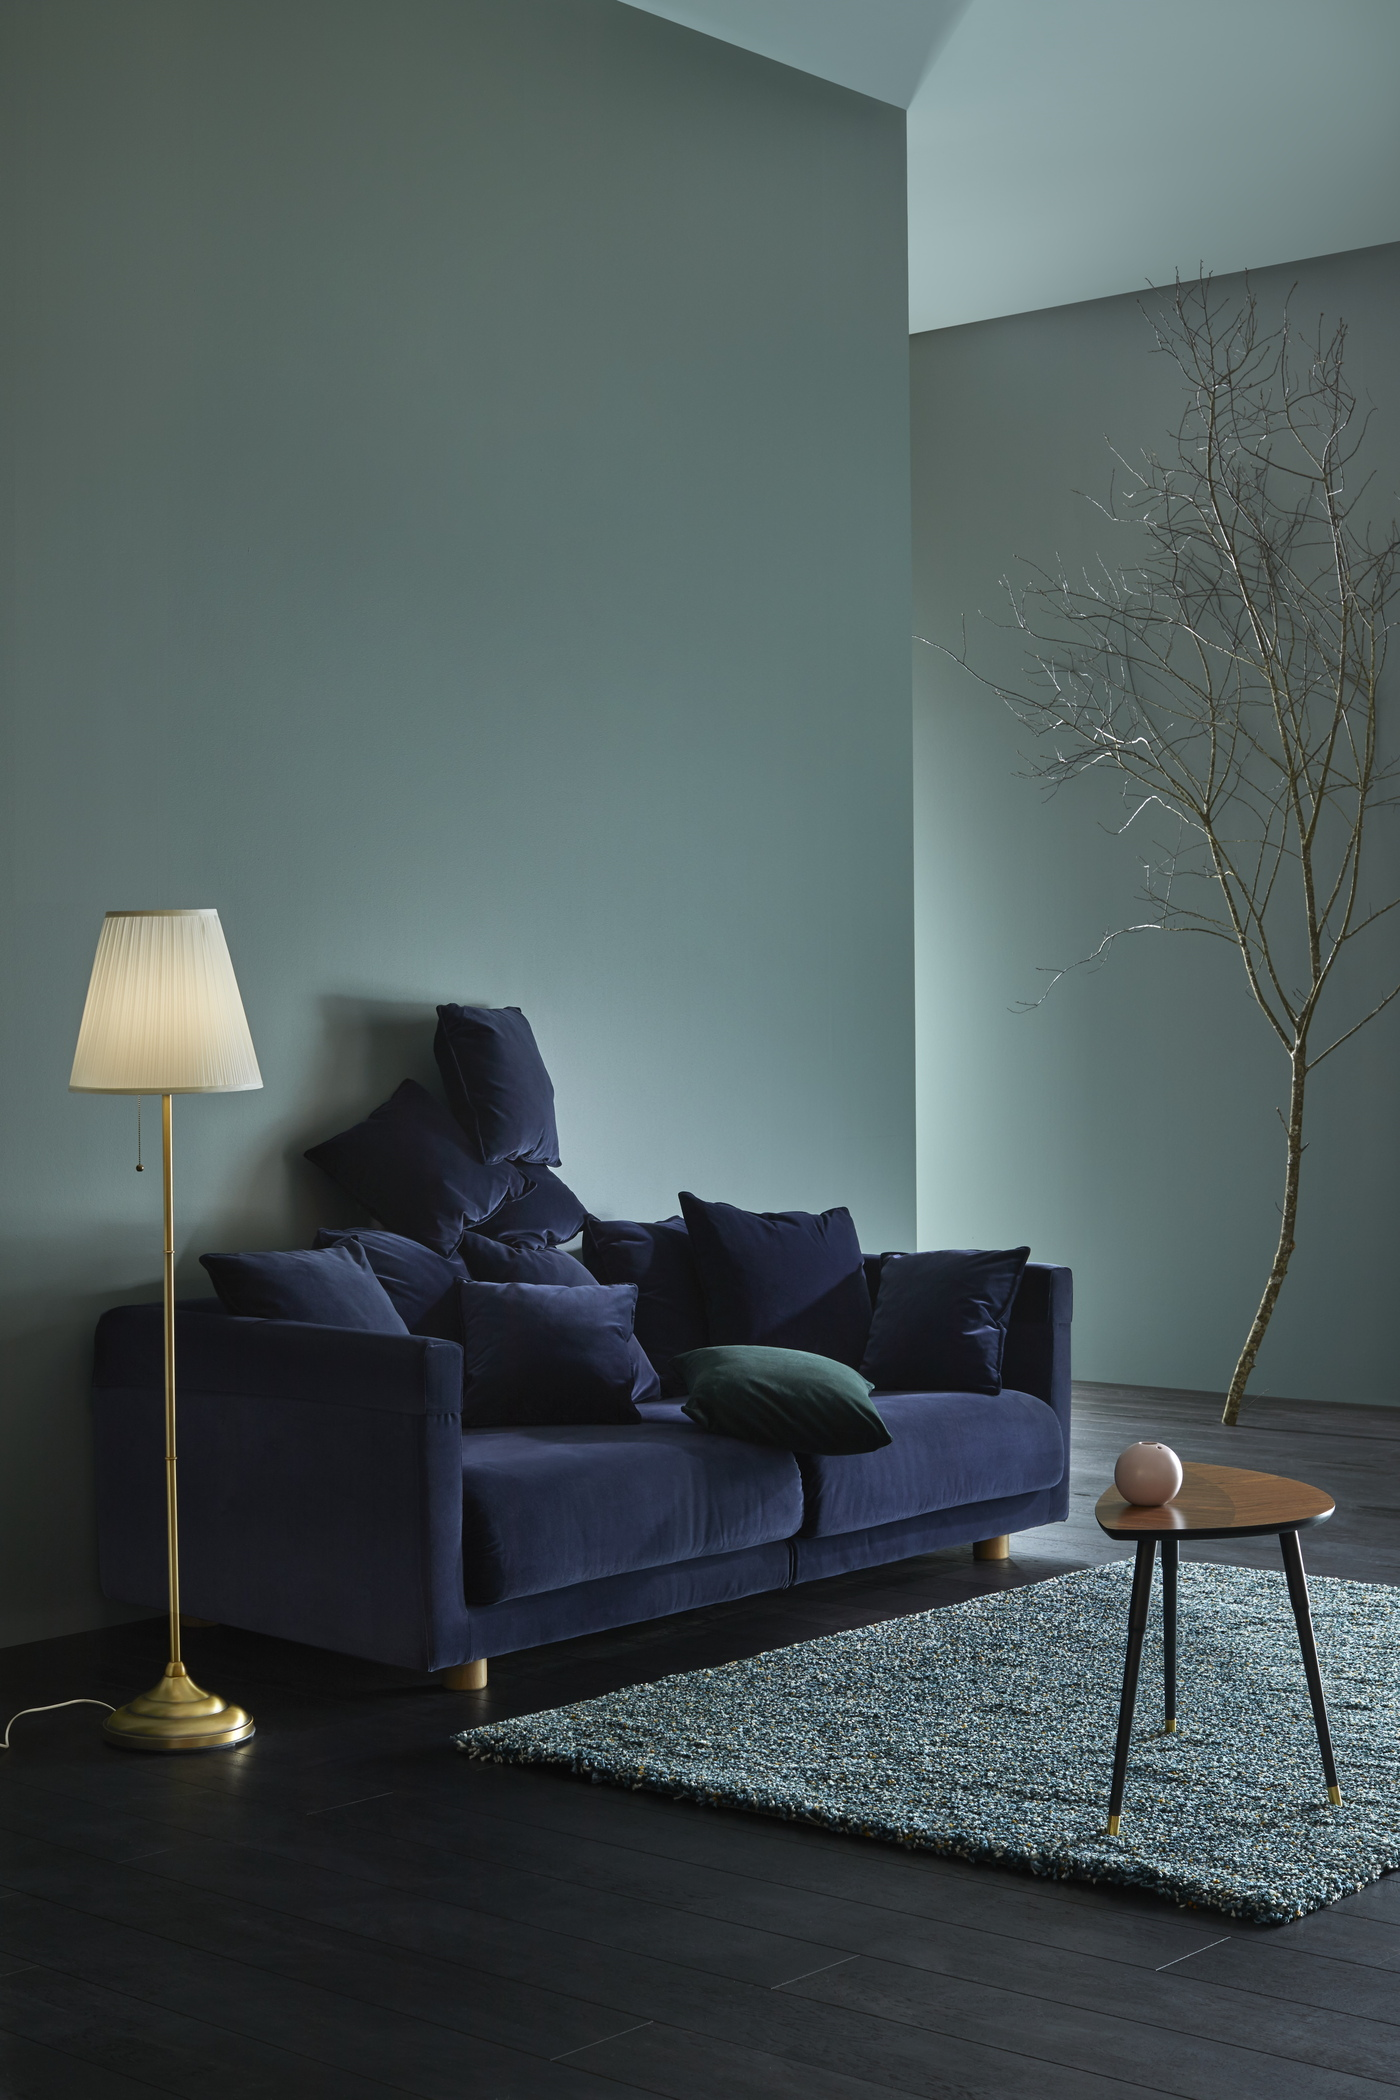 ikea katalog 2019 96. Black Bedroom Furniture Sets. Home Design Ideas